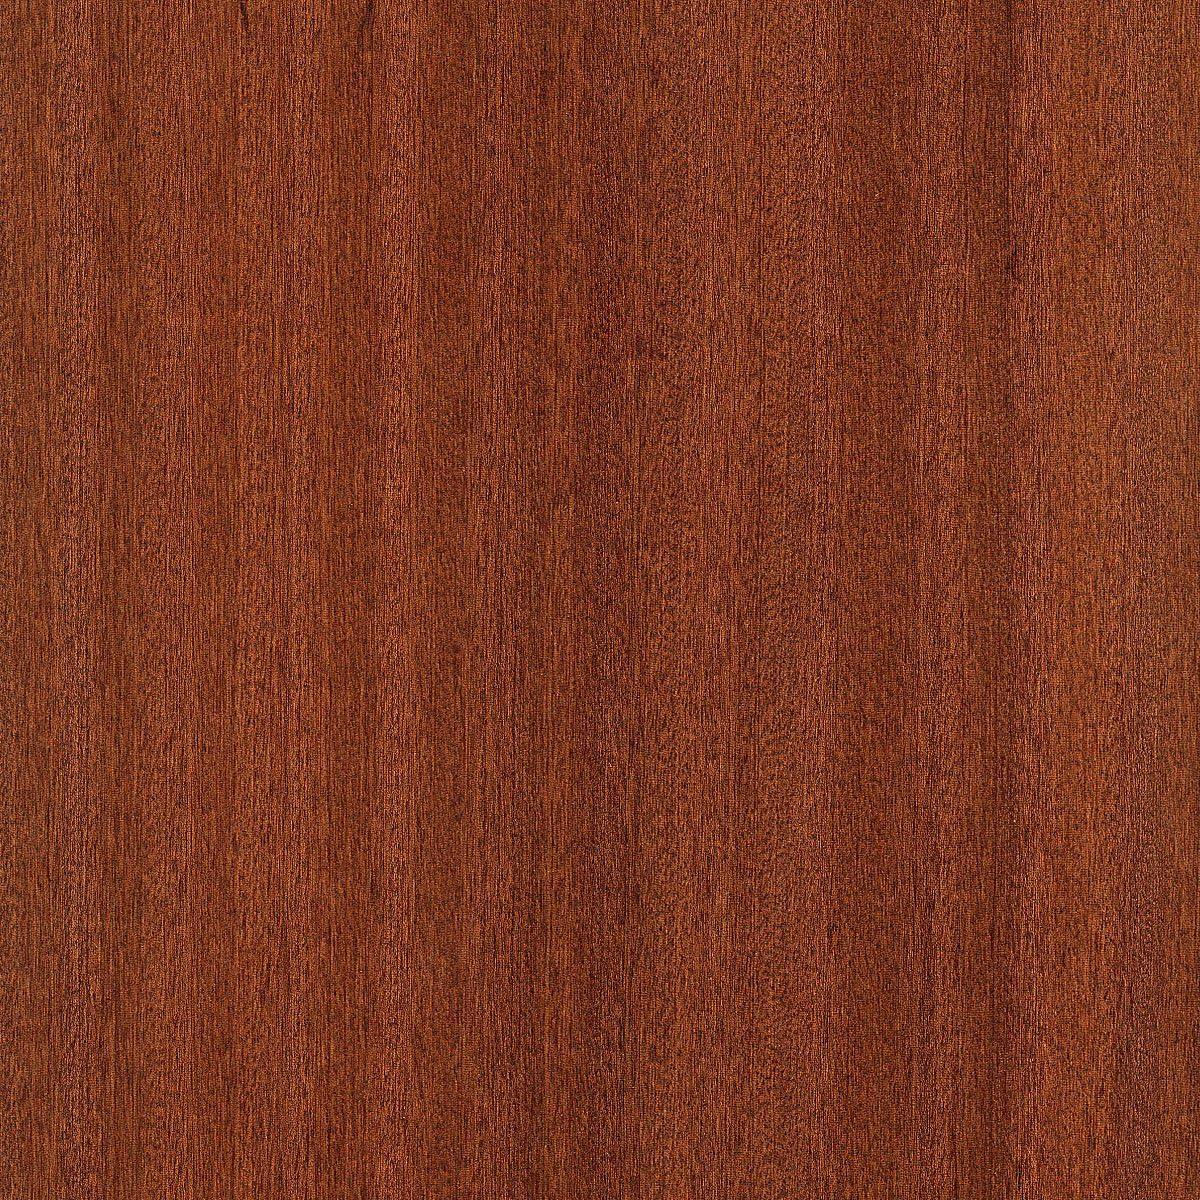 Popularity Wood-All Genuine Sapele Ribbon Striped Wood 48x9 Veneer Cut Sheet Qtr